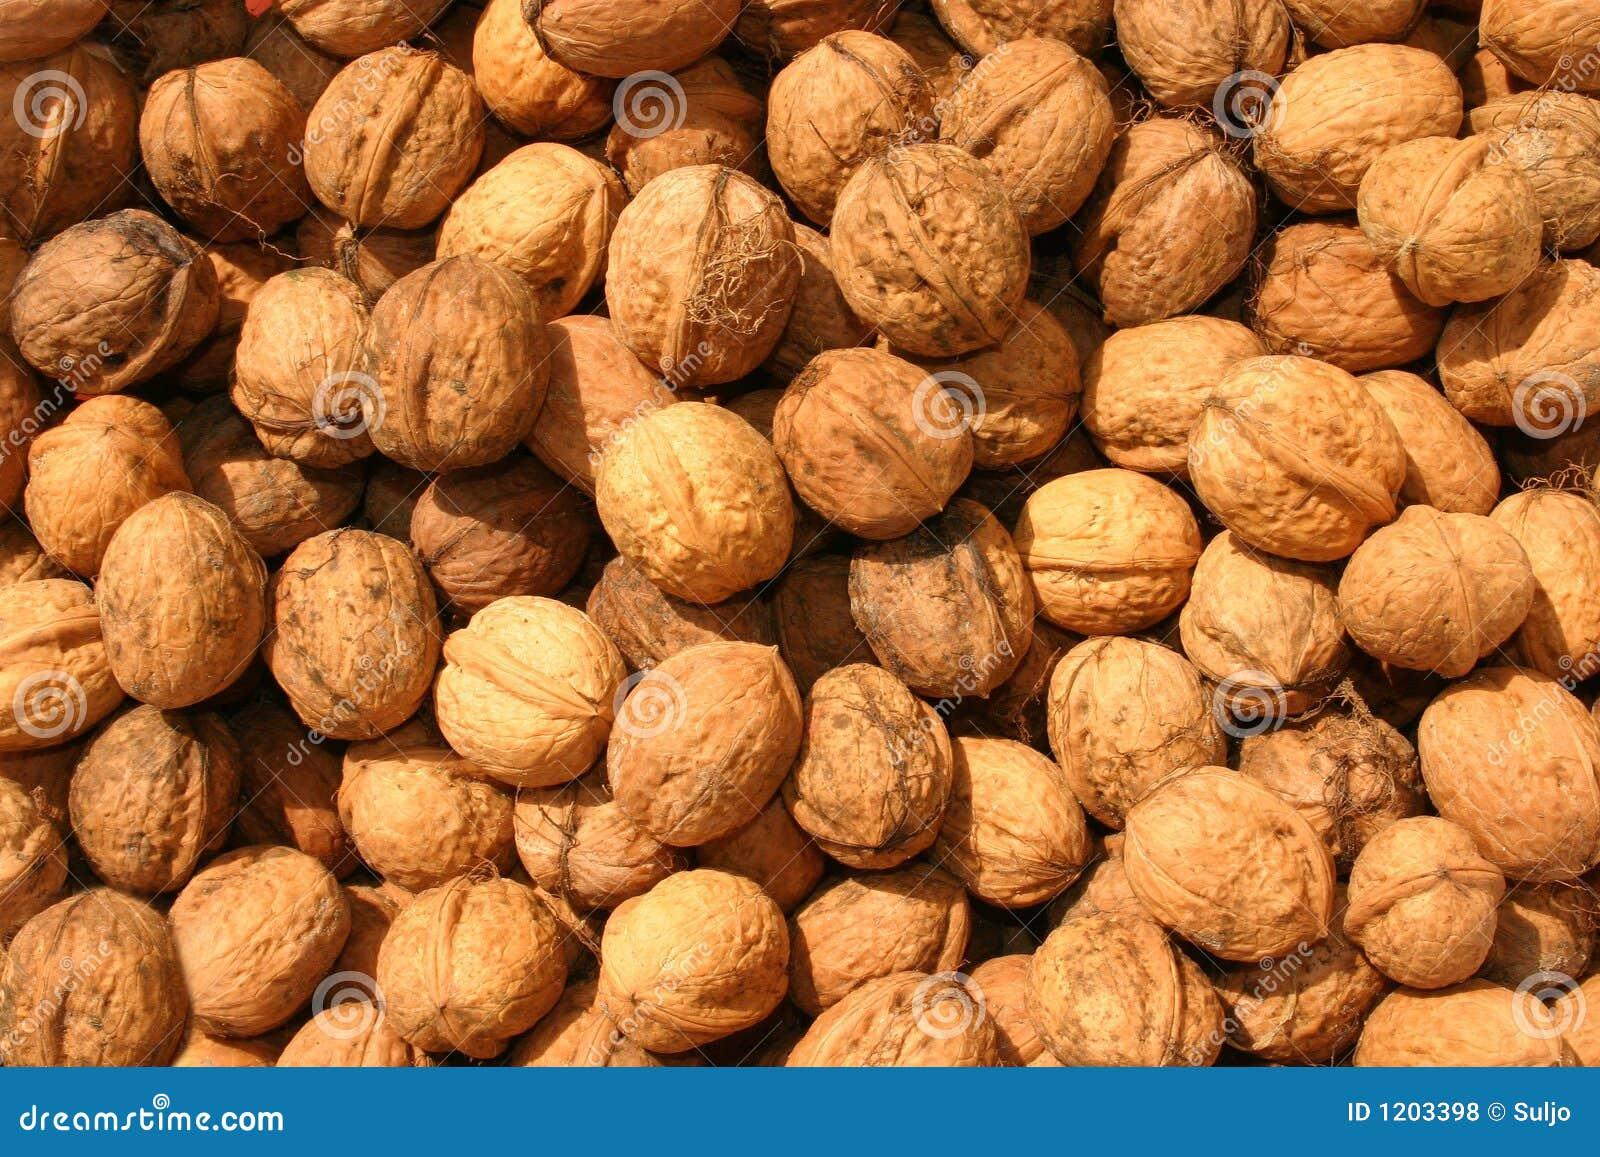 Wallnut background